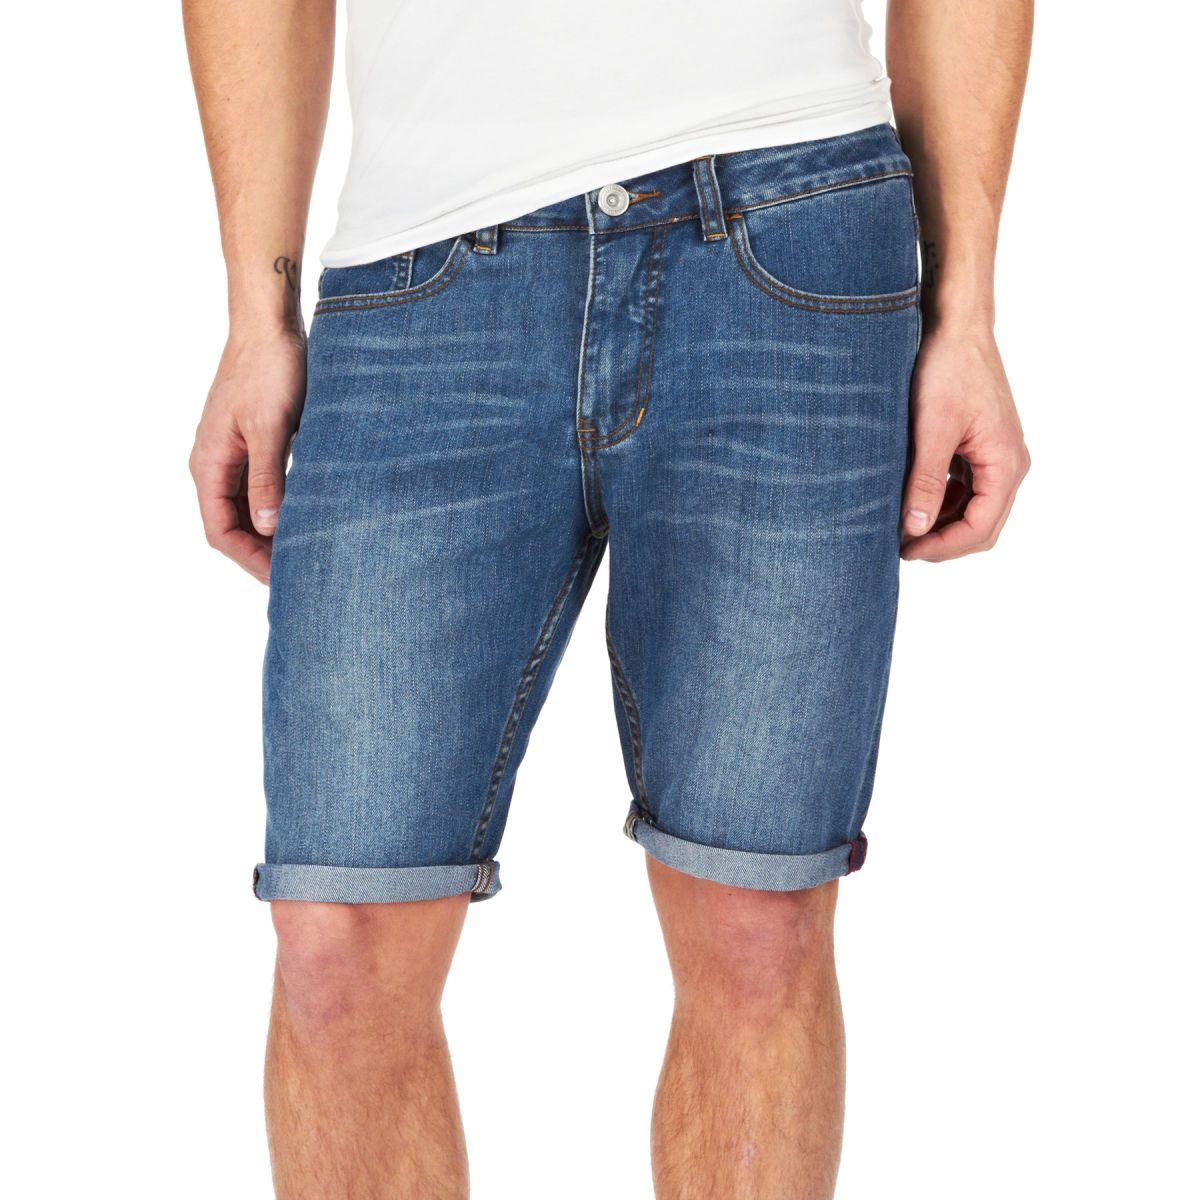 17 Best images about Men Shorts on Pinterest | Men's denim, Summer ...